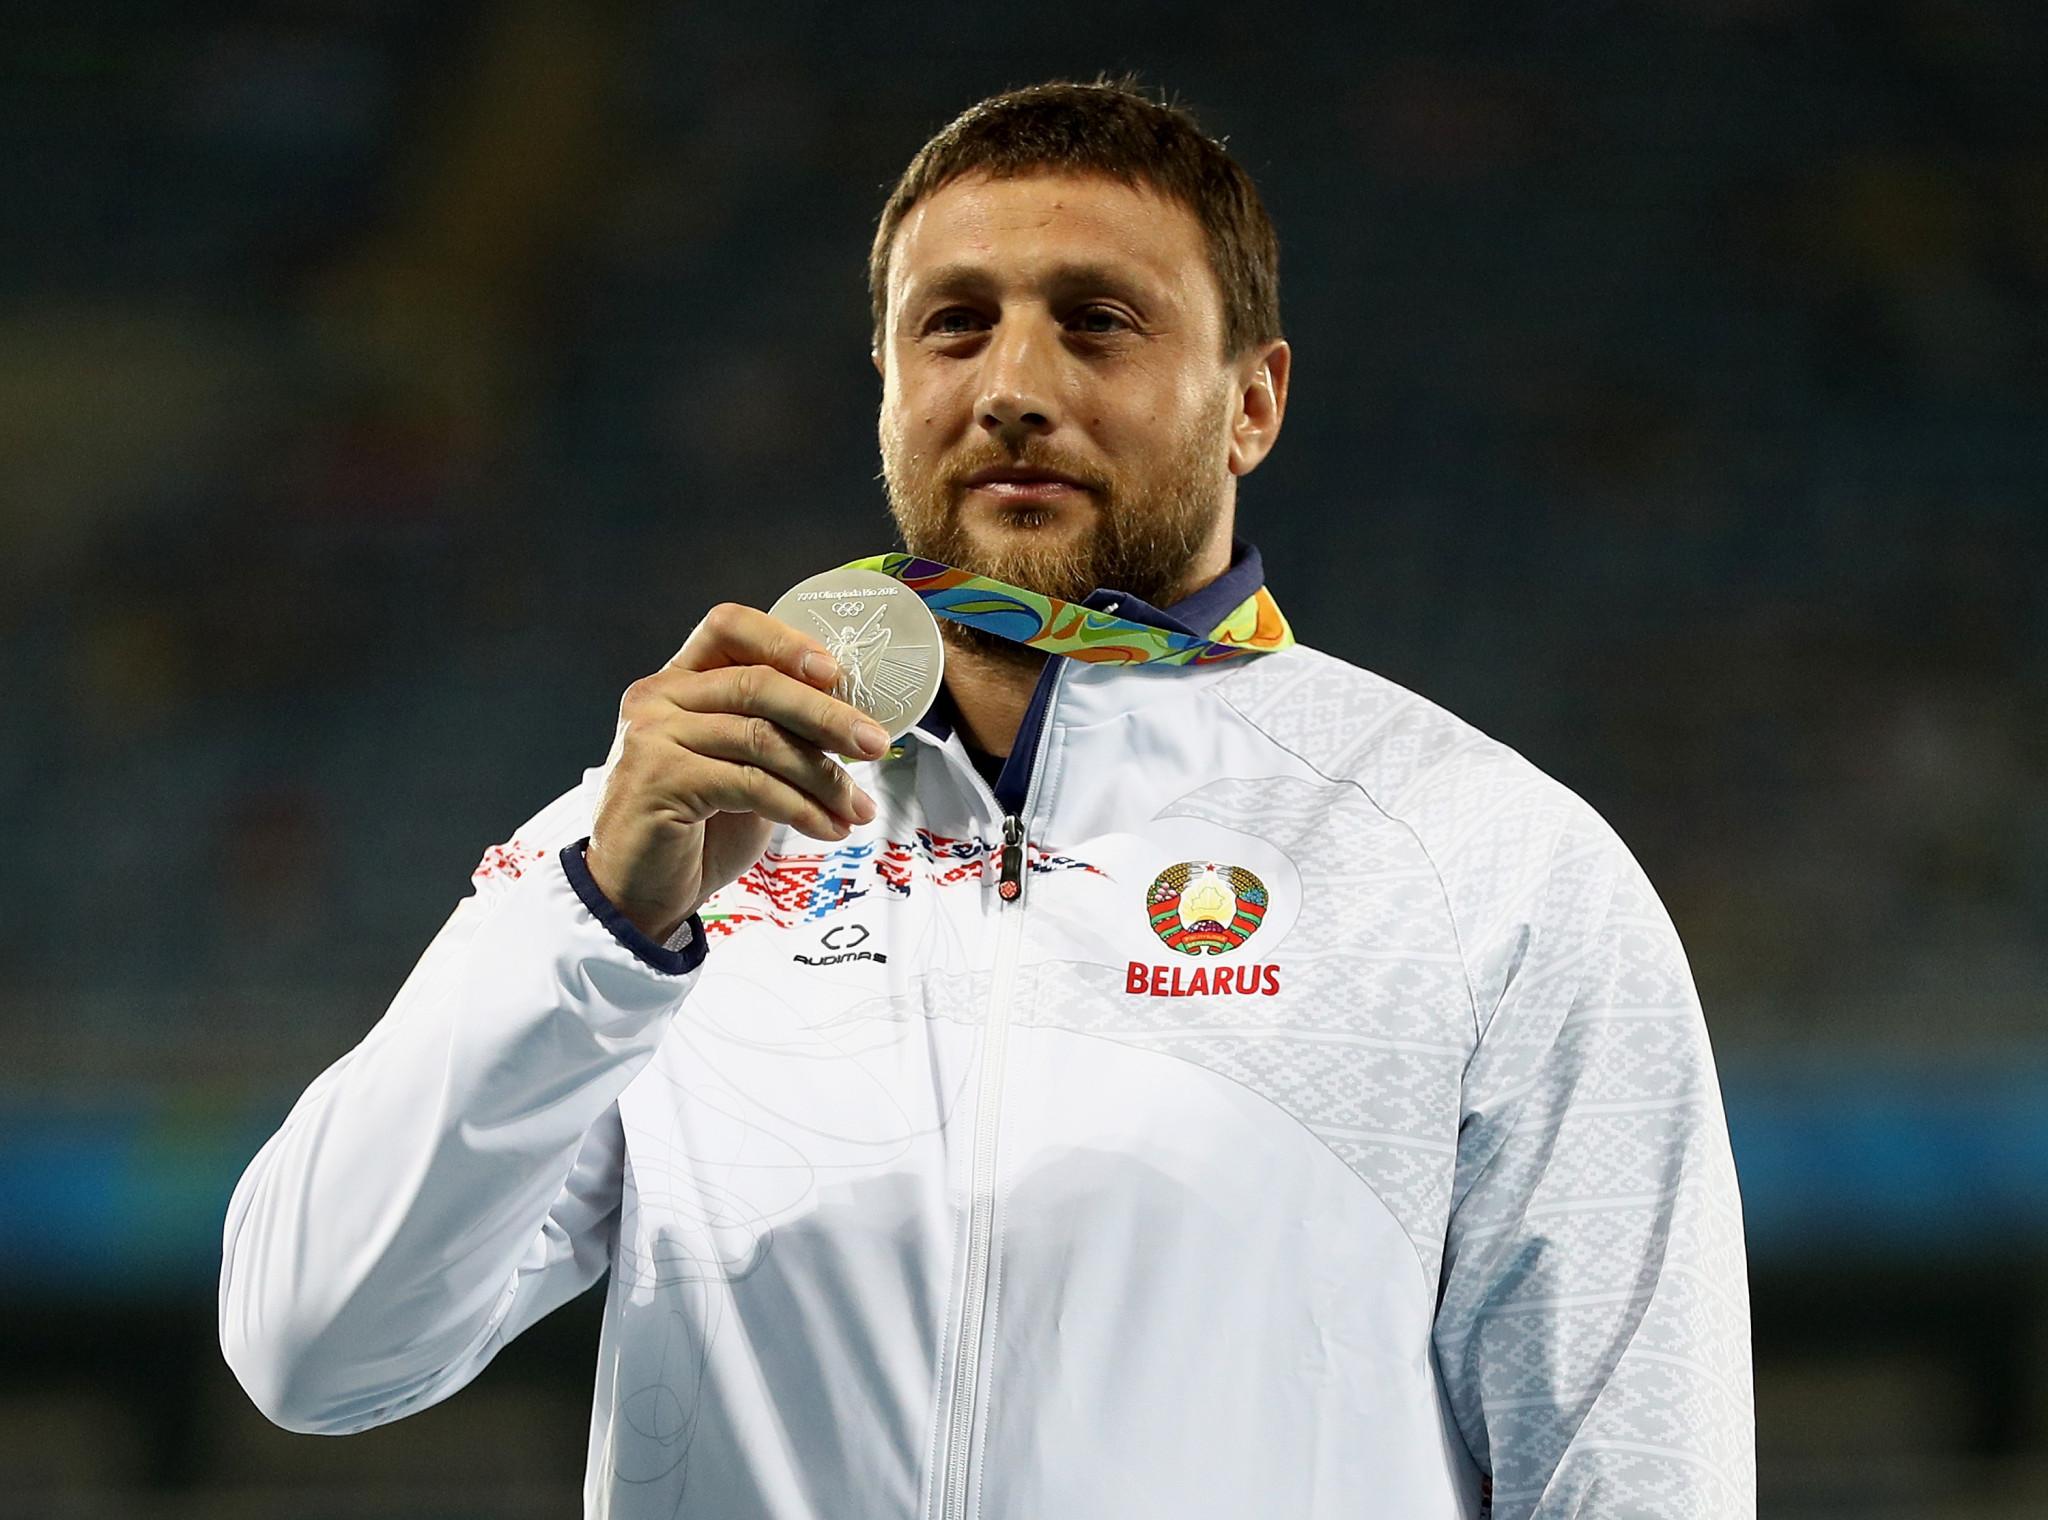 Drugs cheat Tsikhan carries European Games Flame